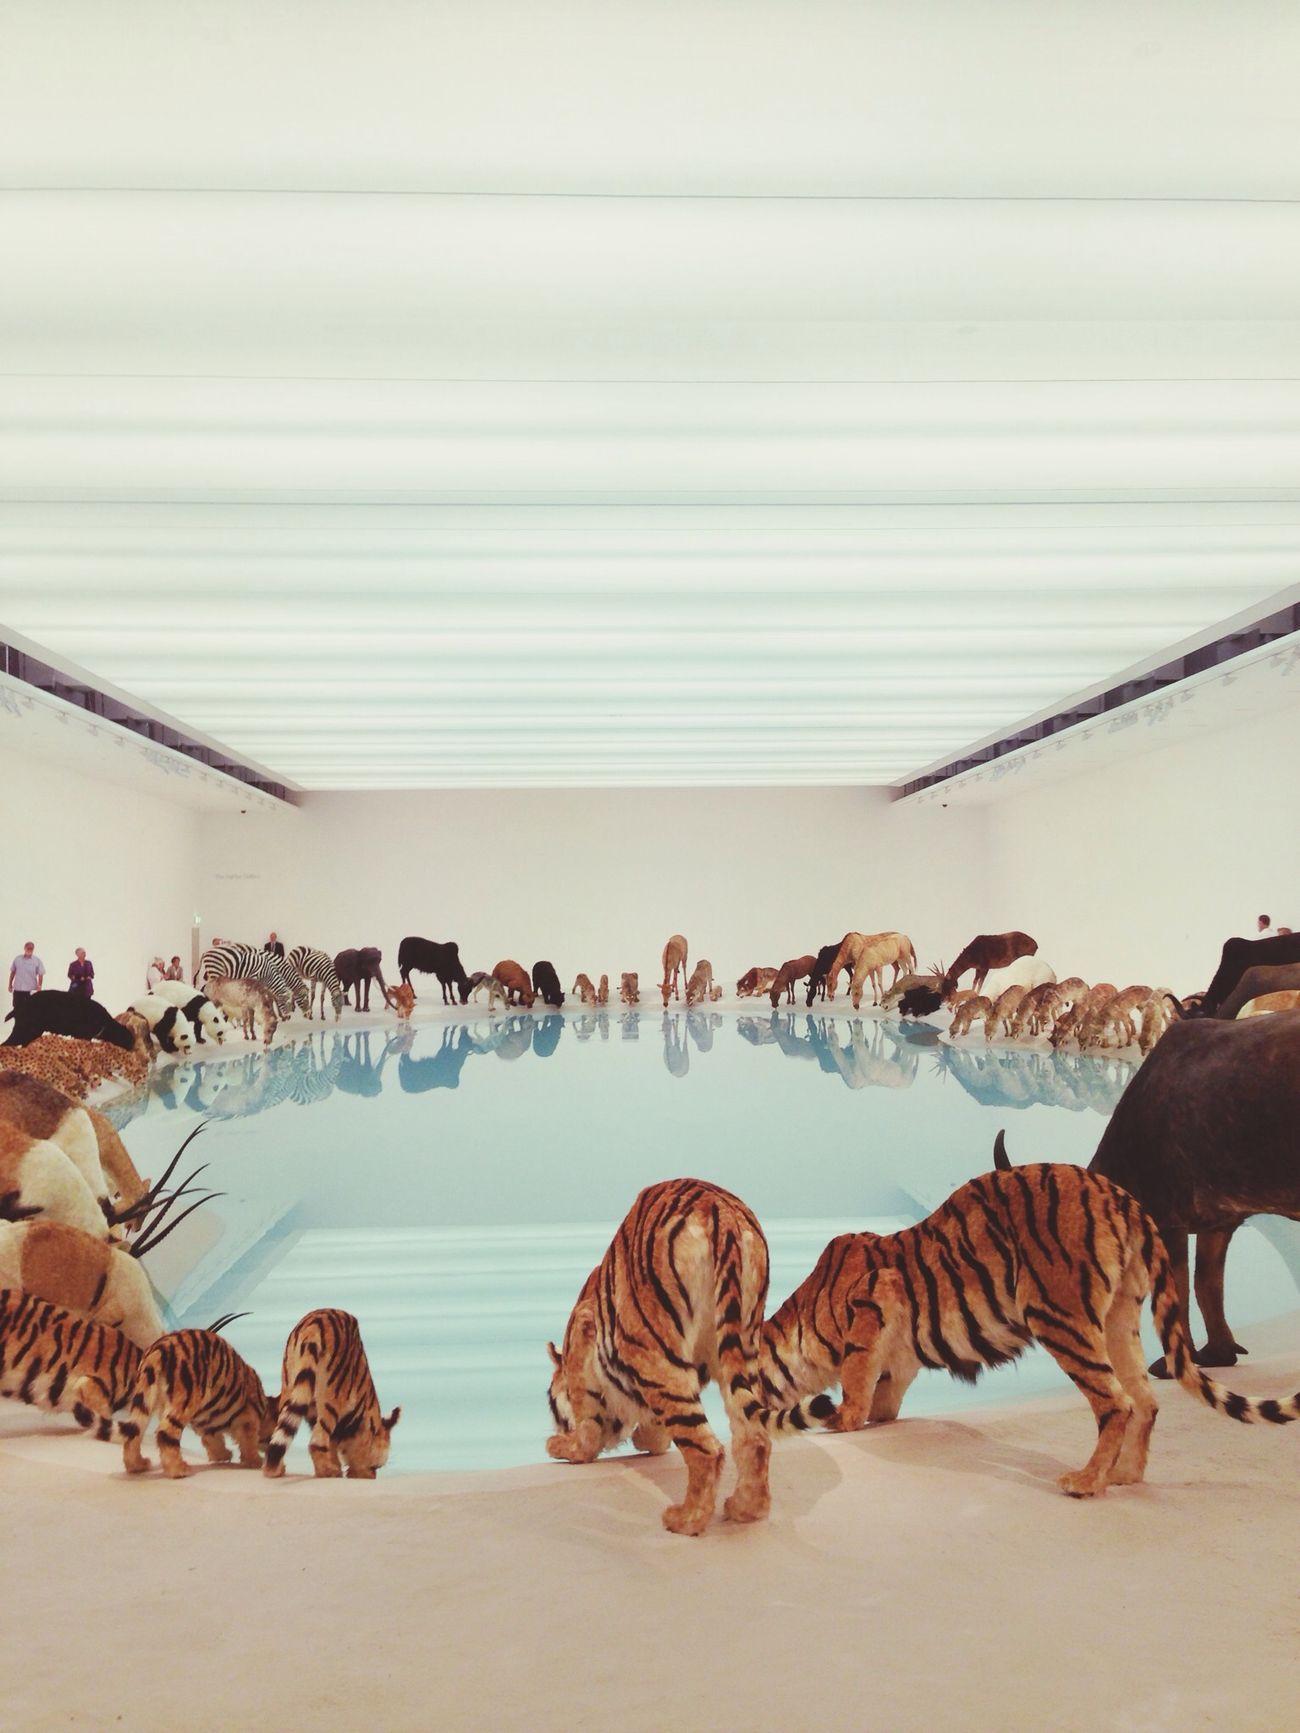 Cai Guo-qiang Fantastic Exhibition